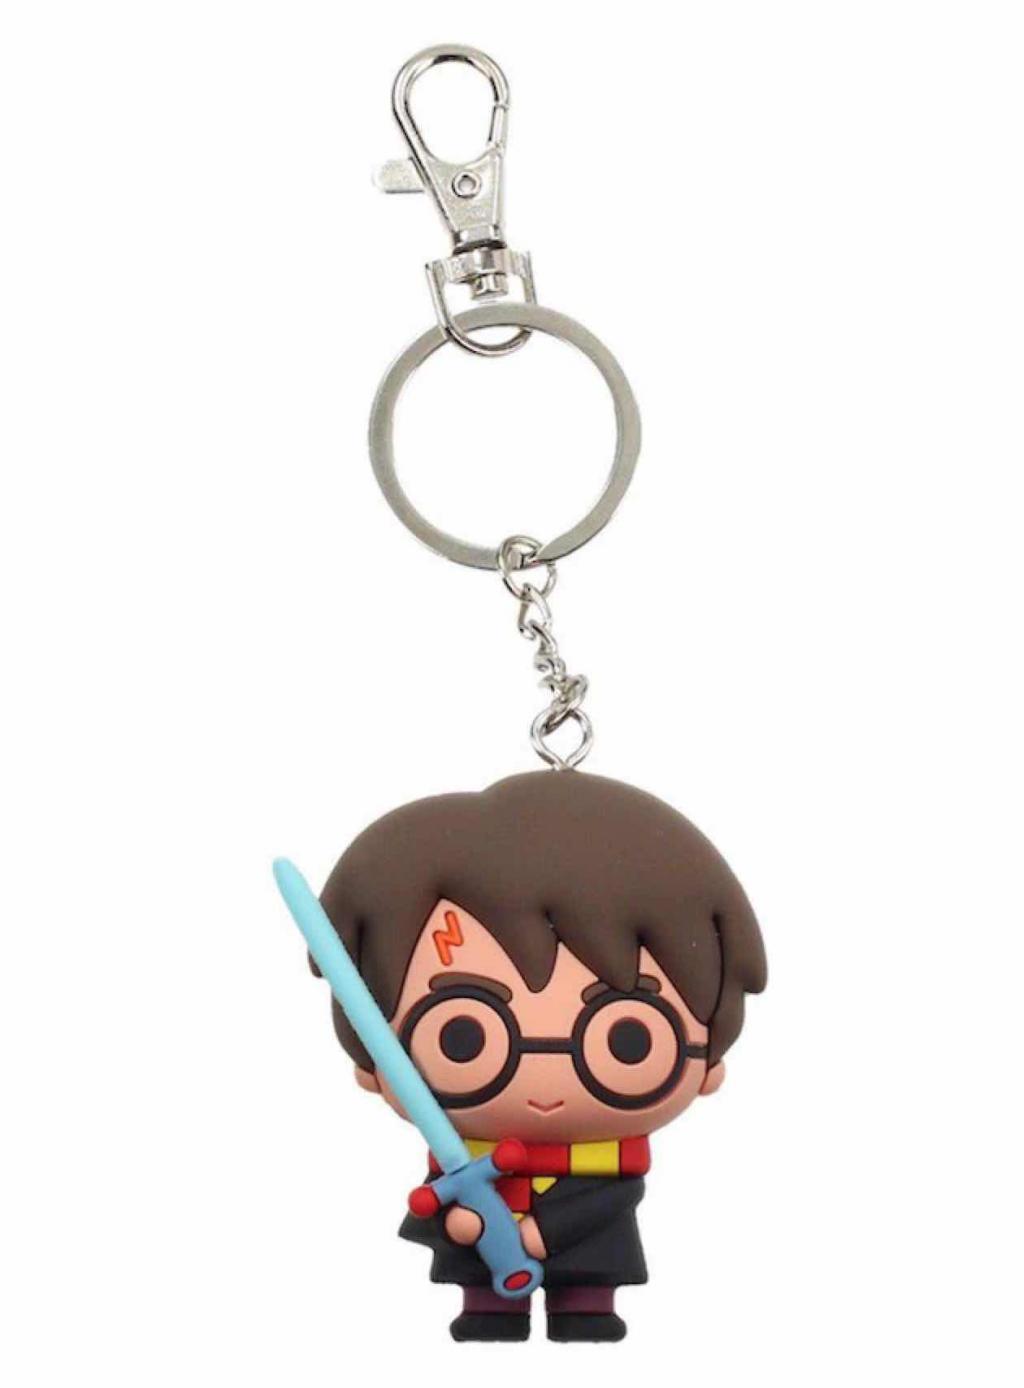 HARRY POTTER - Rubber Figure Keychain - Harry Potter Sword of Gryff..